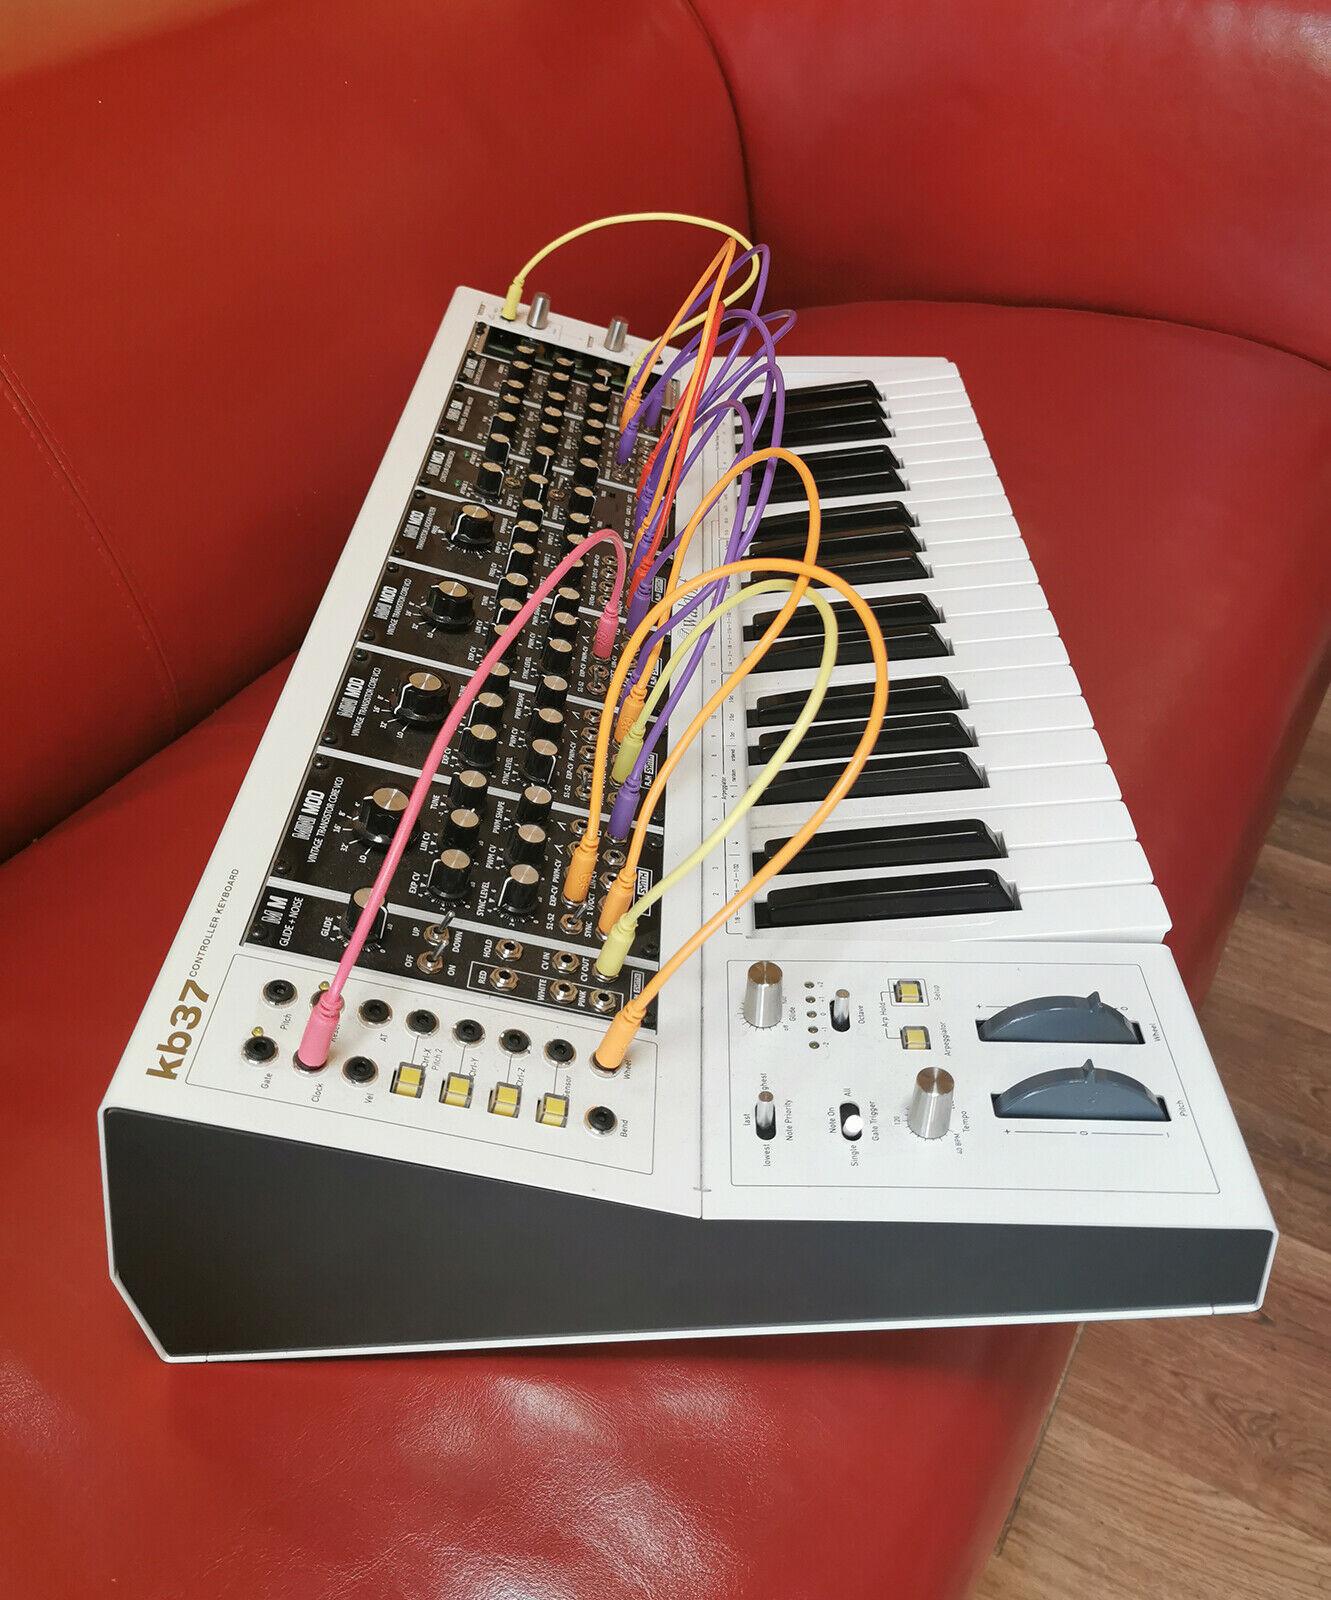 matrixsynth warldorf kb37 ajh minimoog eurorack modular synth. Black Bedroom Furniture Sets. Home Design Ideas